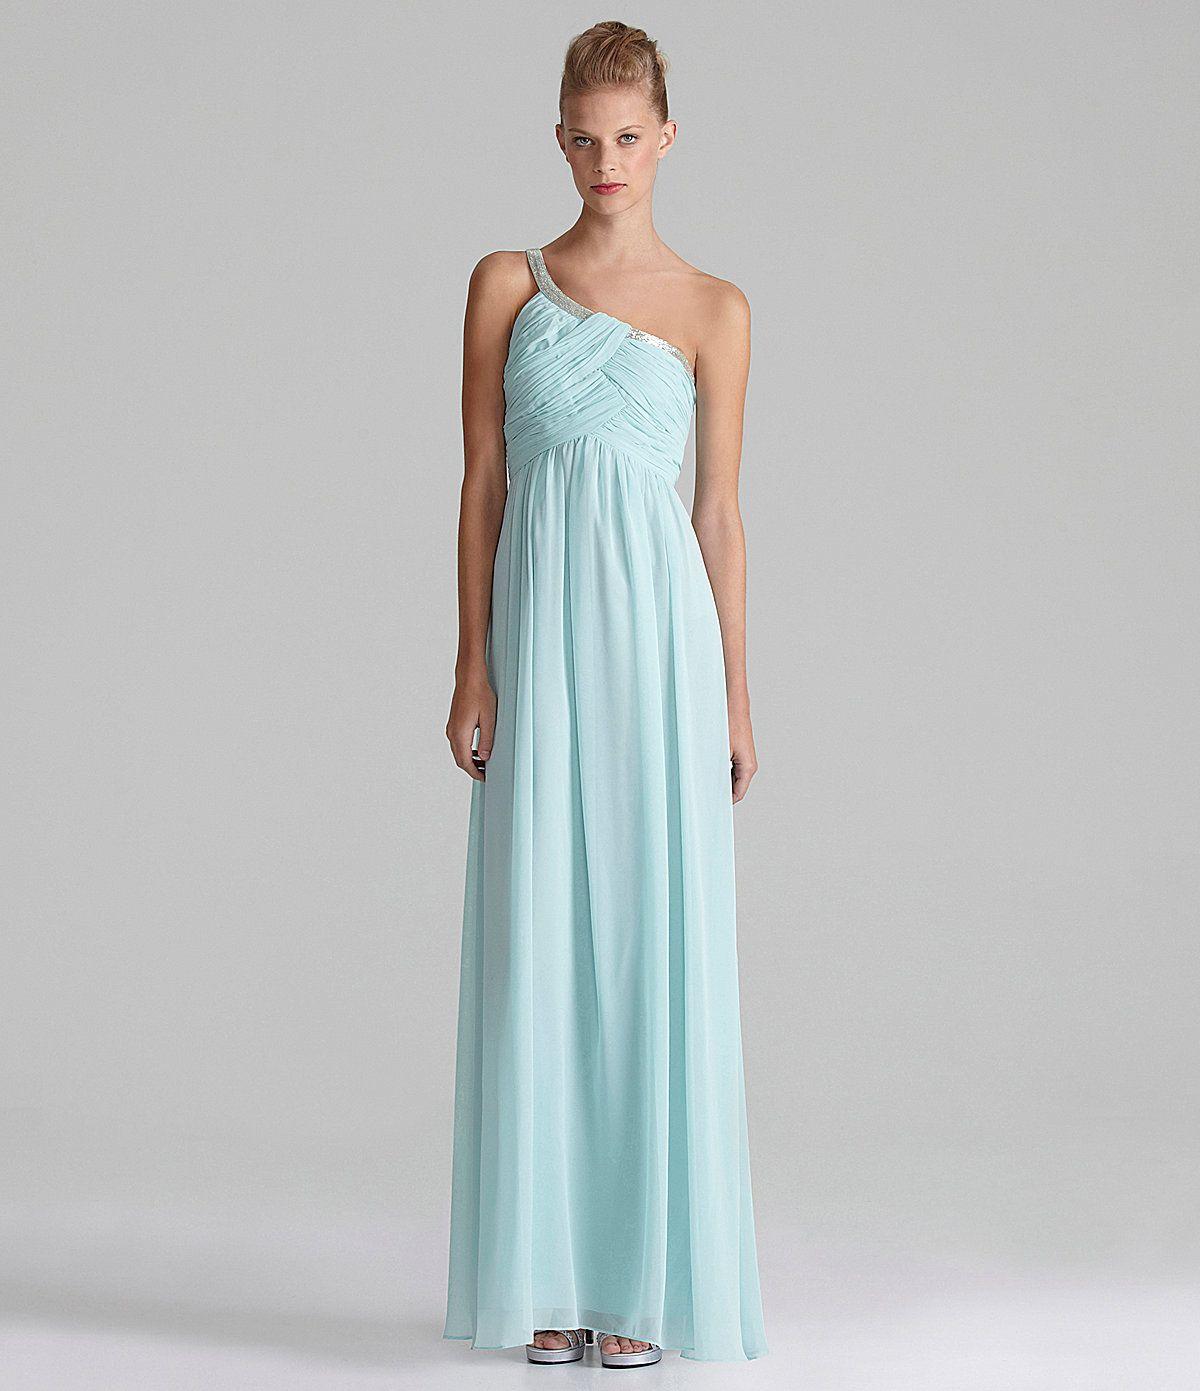 Calvin Klein One-Shoulder Chiffon Gown | Dillards.com | Fashion ...